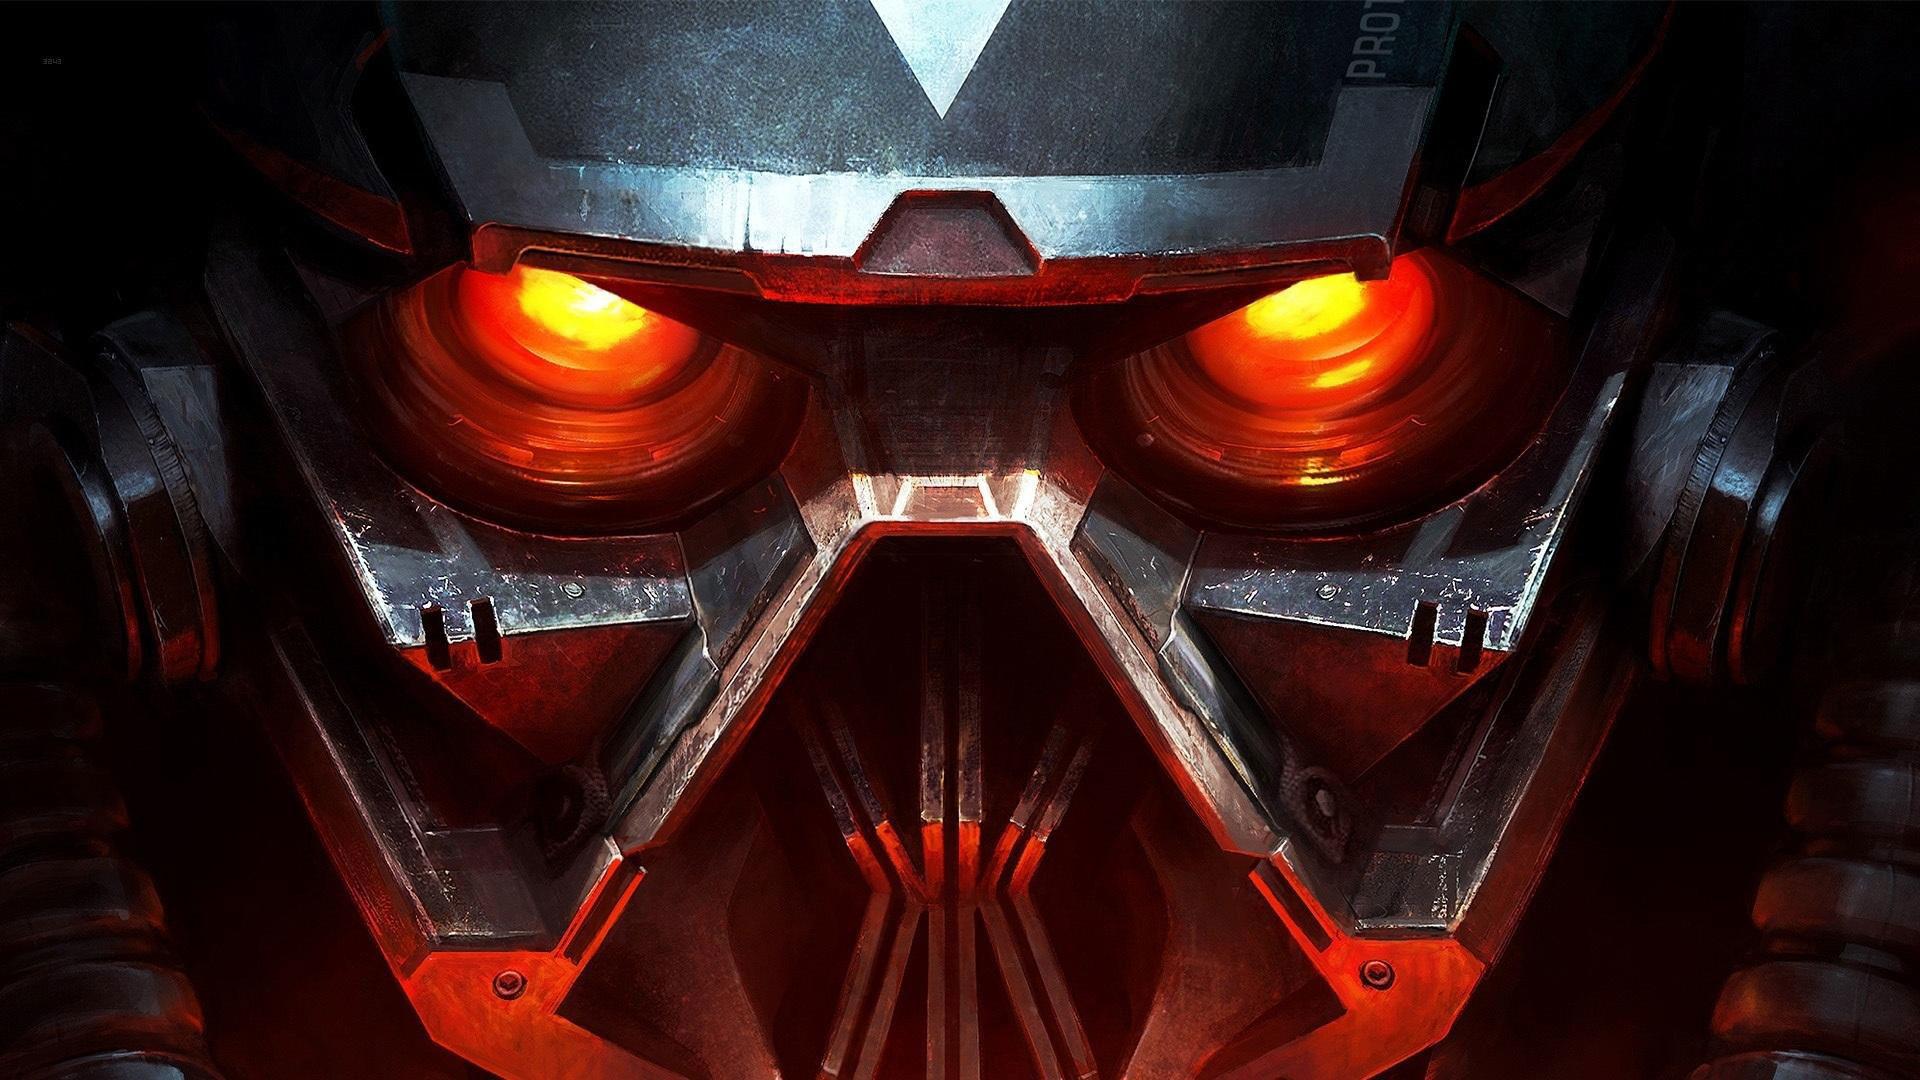 hd pics photos metal robot eye transformer hollywood glowing red eye  technology hd quality desktop background